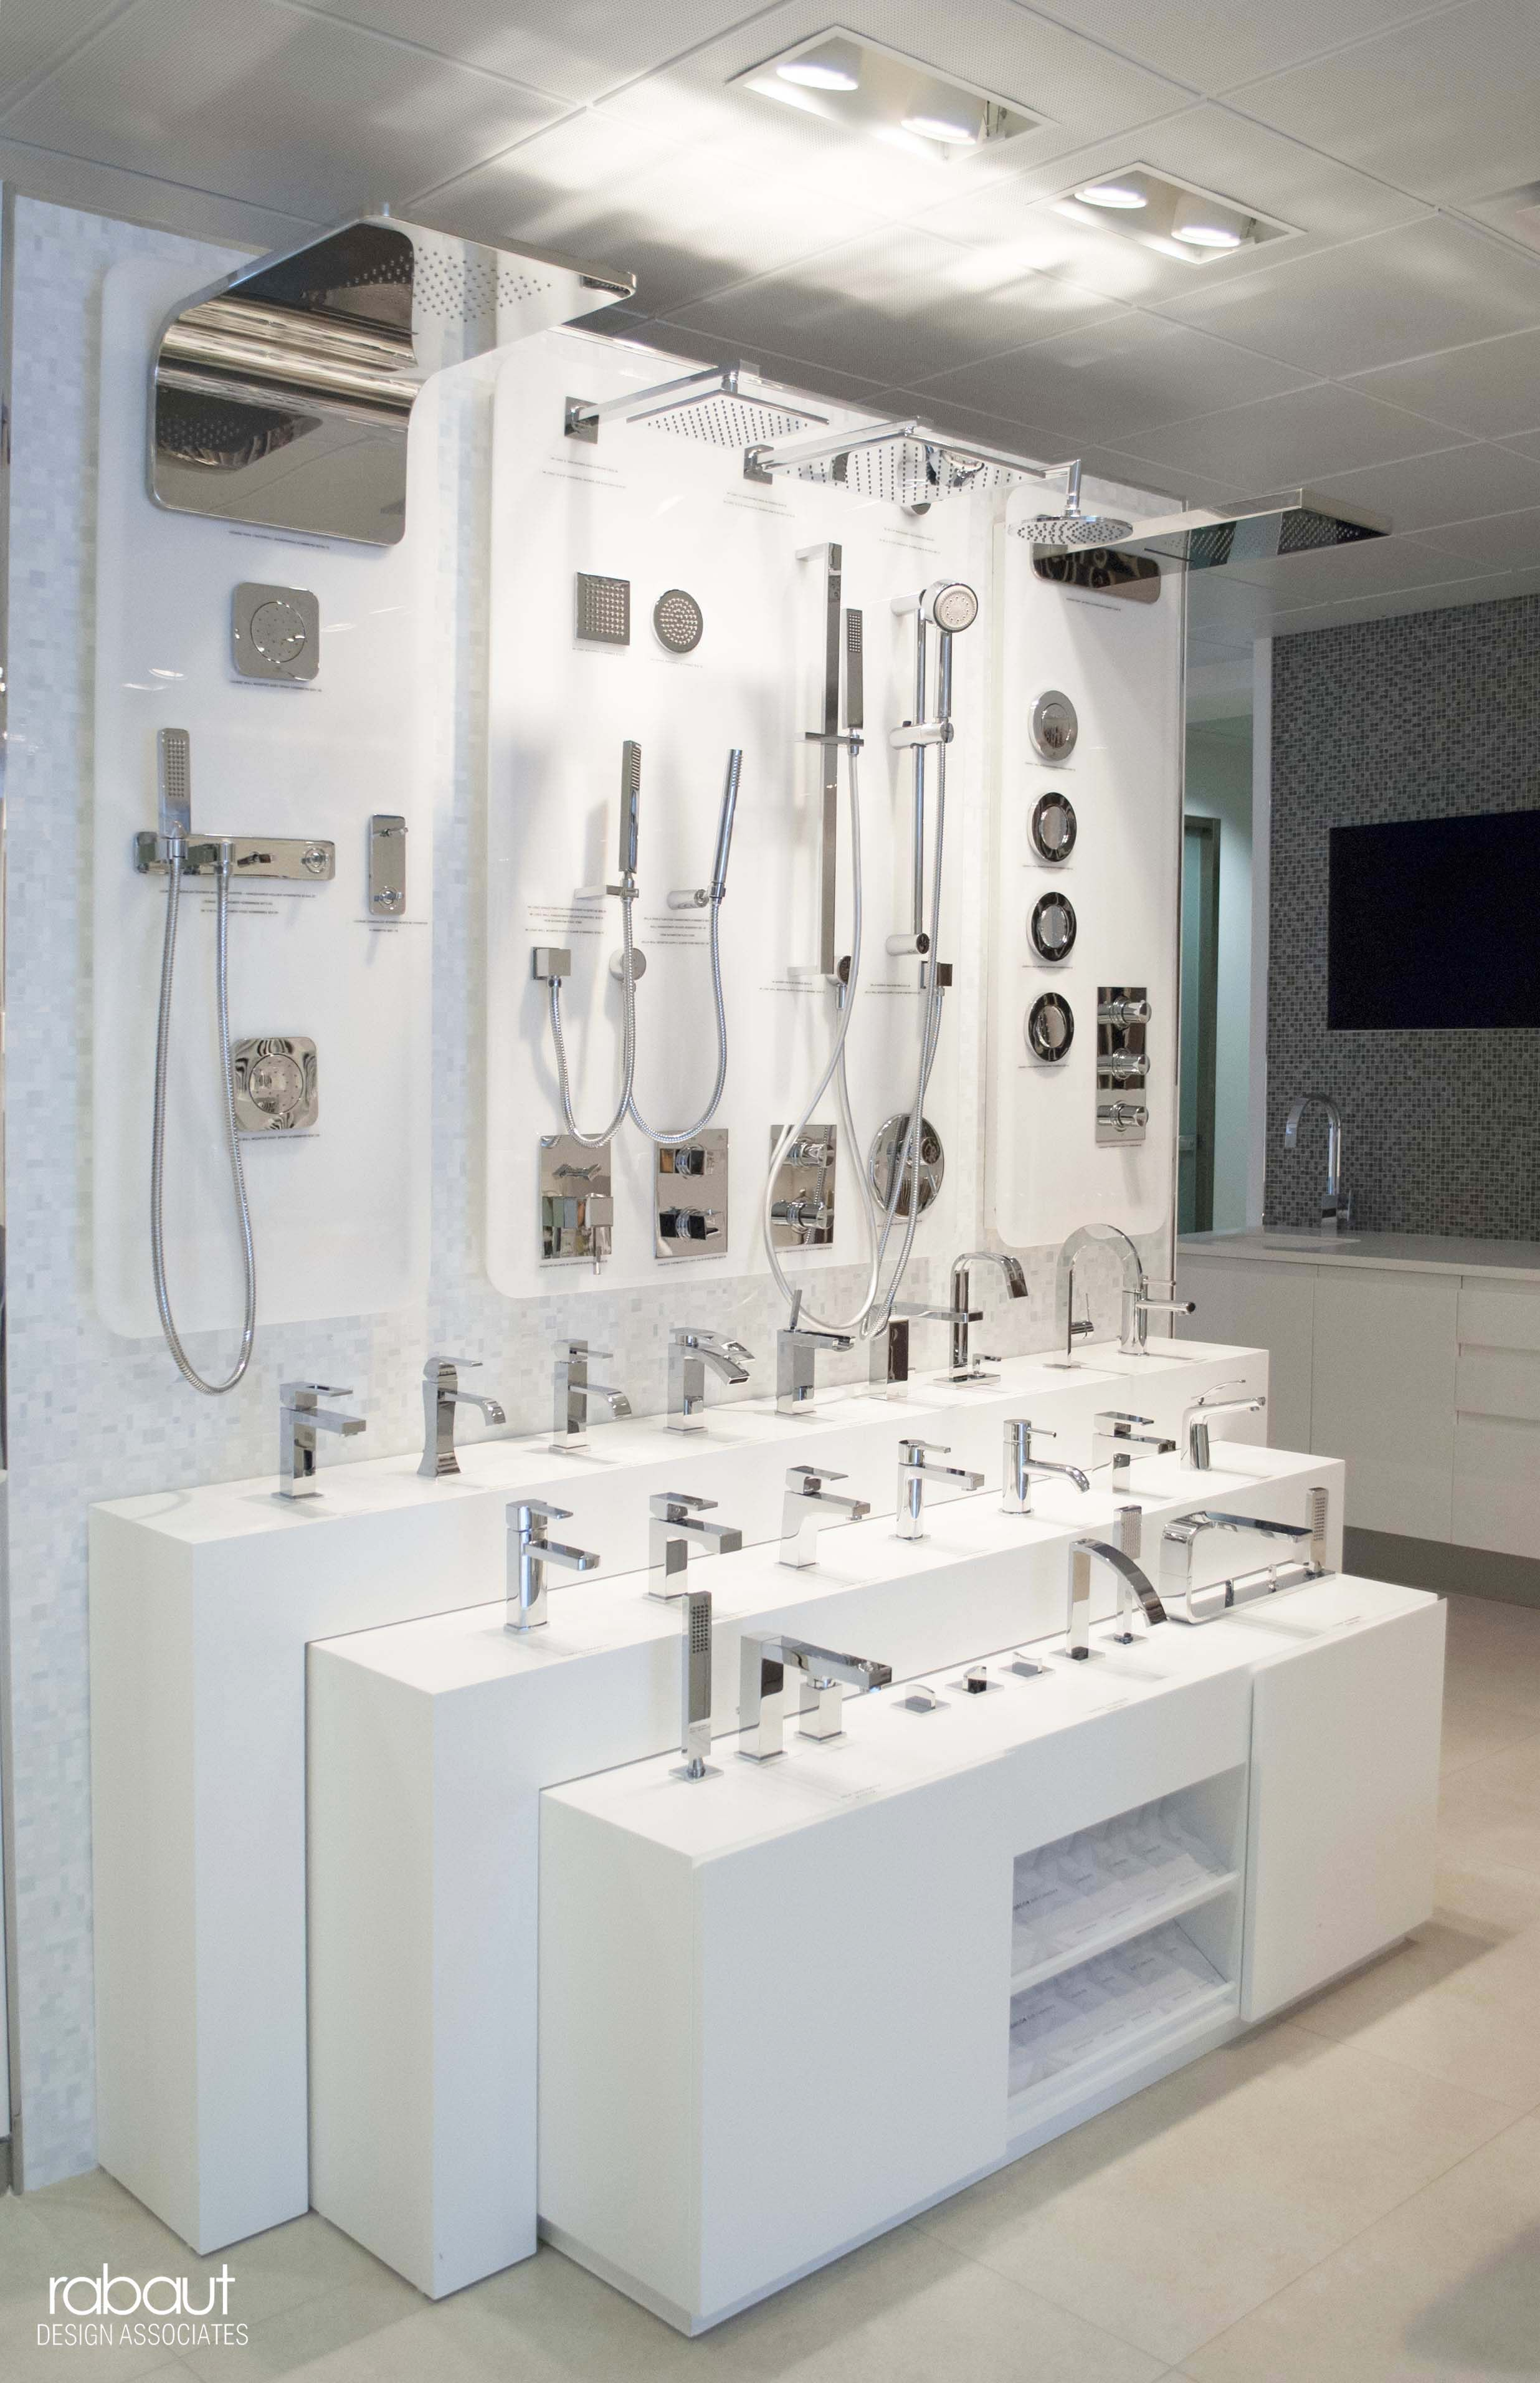 Porcelanosa Showroom By Rabaut Design Associates Porcelanosa Showroom Pinterest Showroom